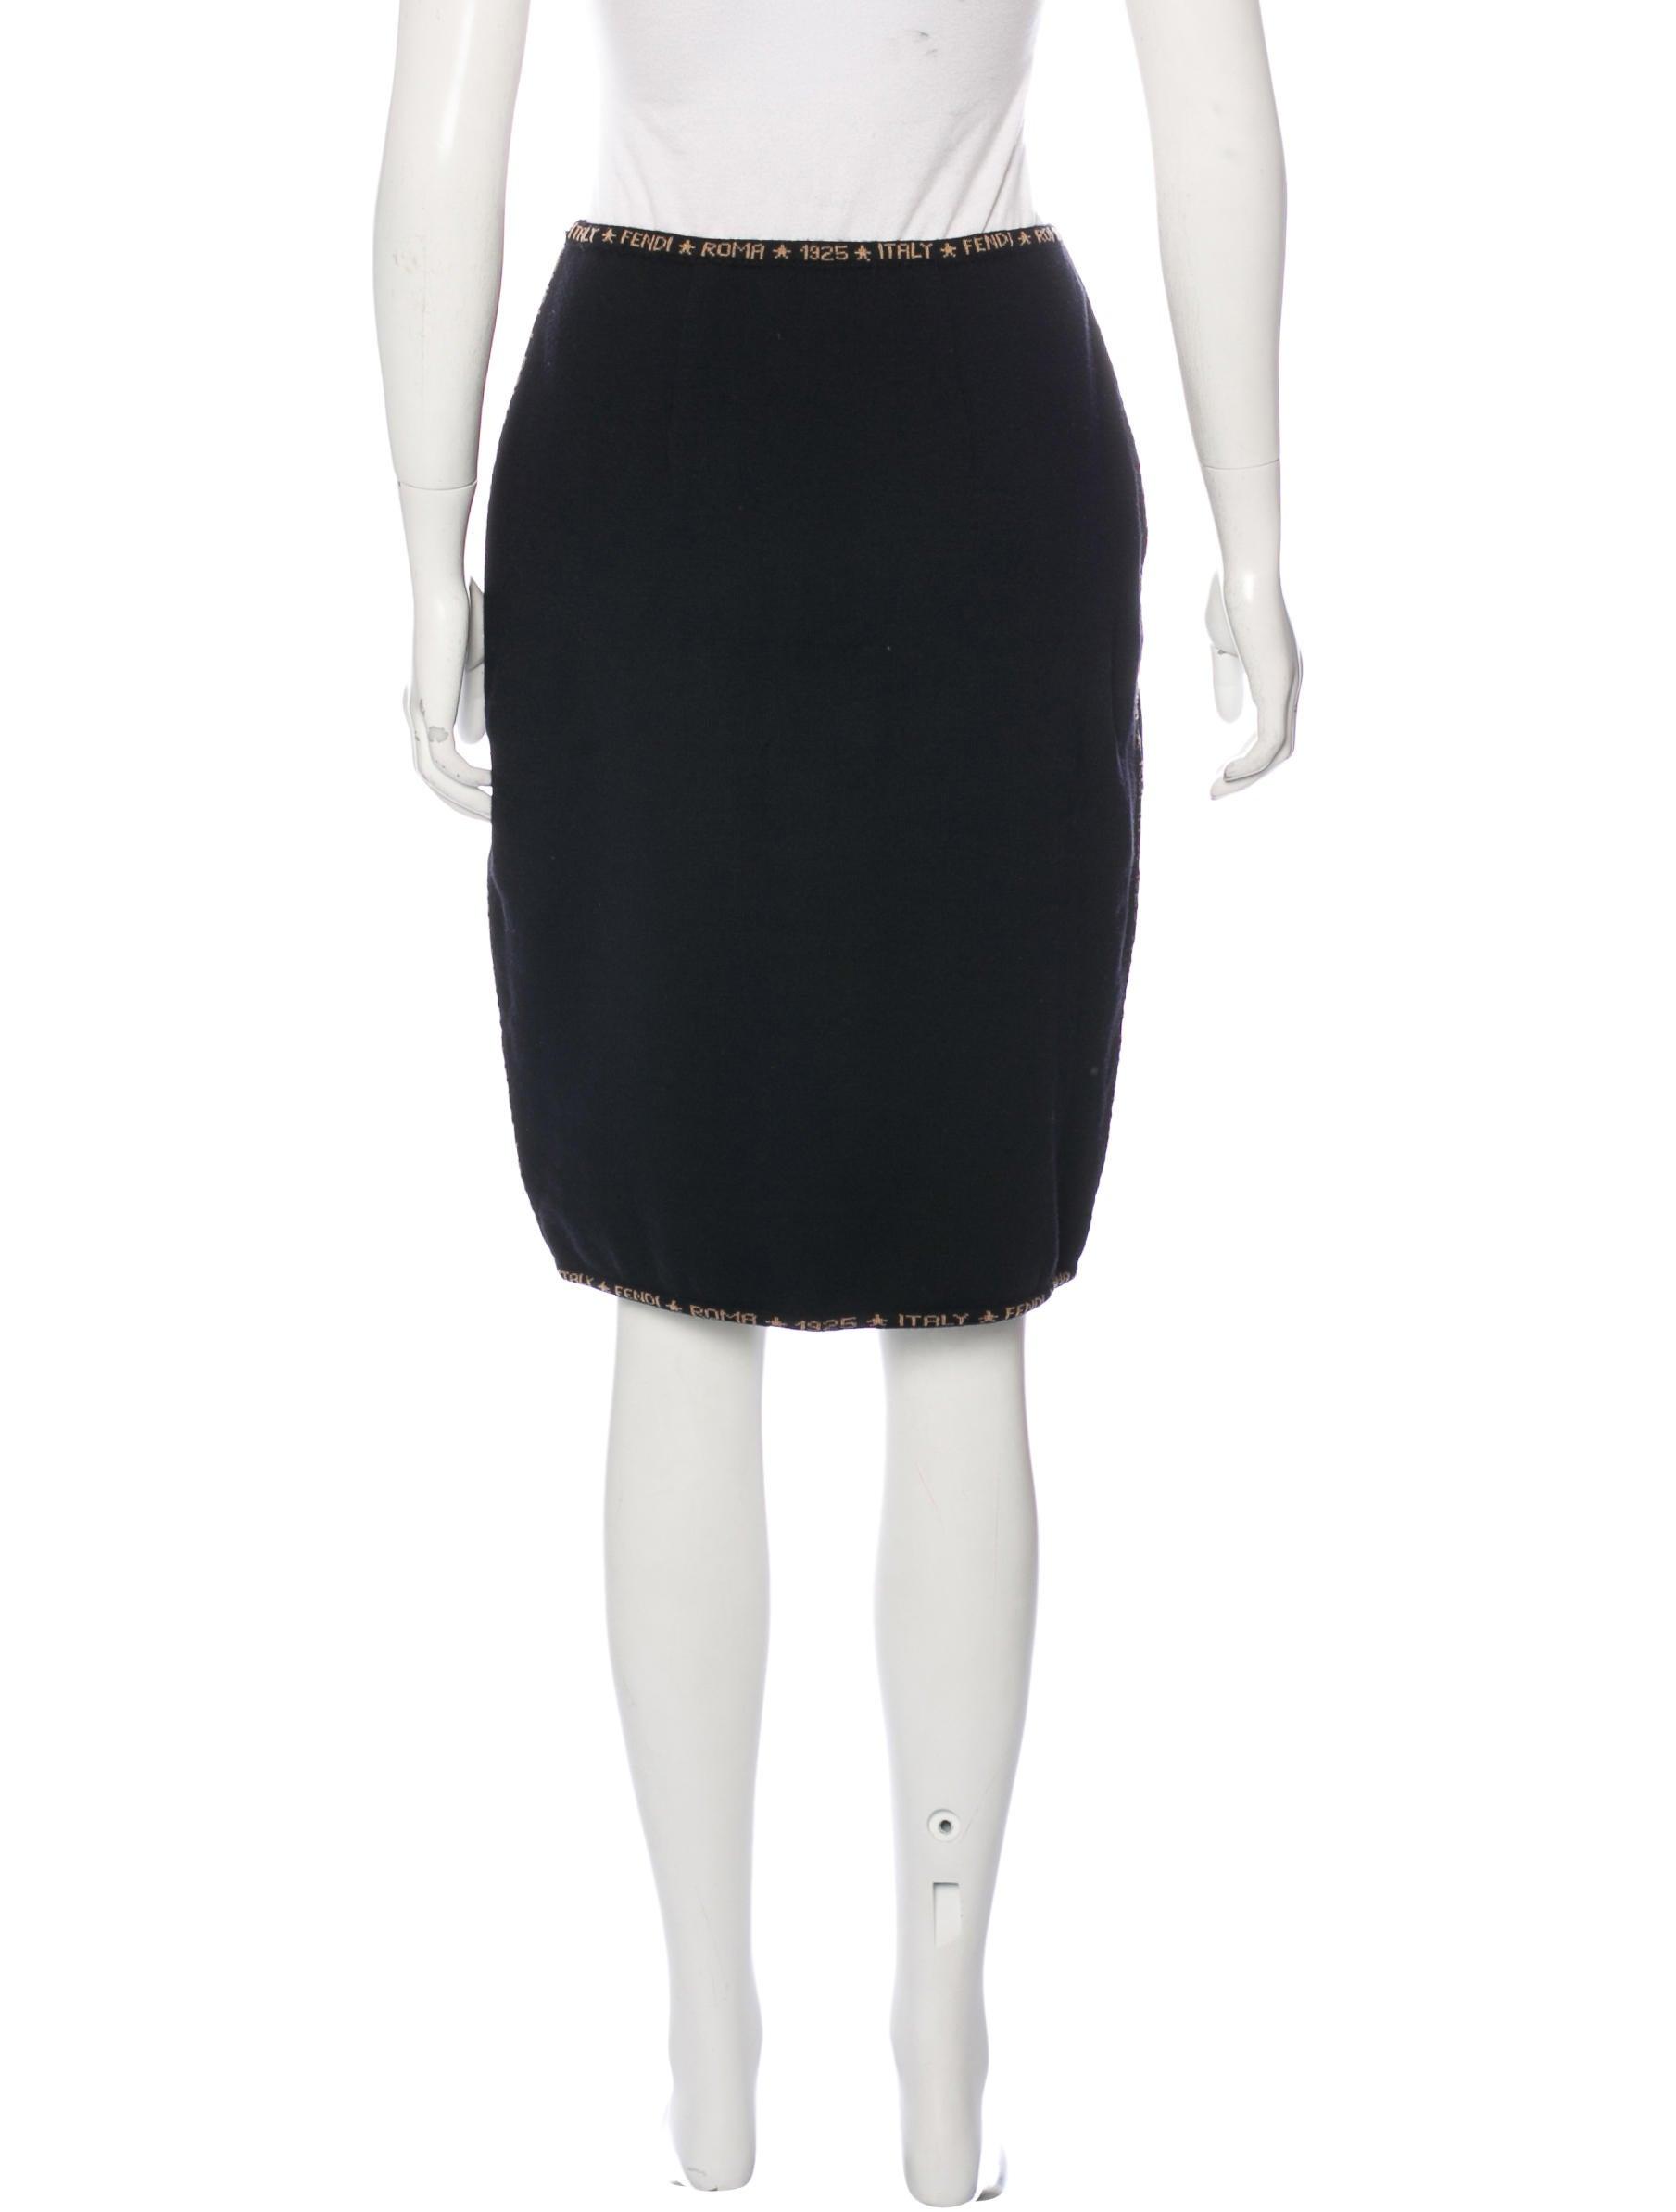 Fendi Knit Pencil Skirt - Clothing - FEN53592 | The RealReal